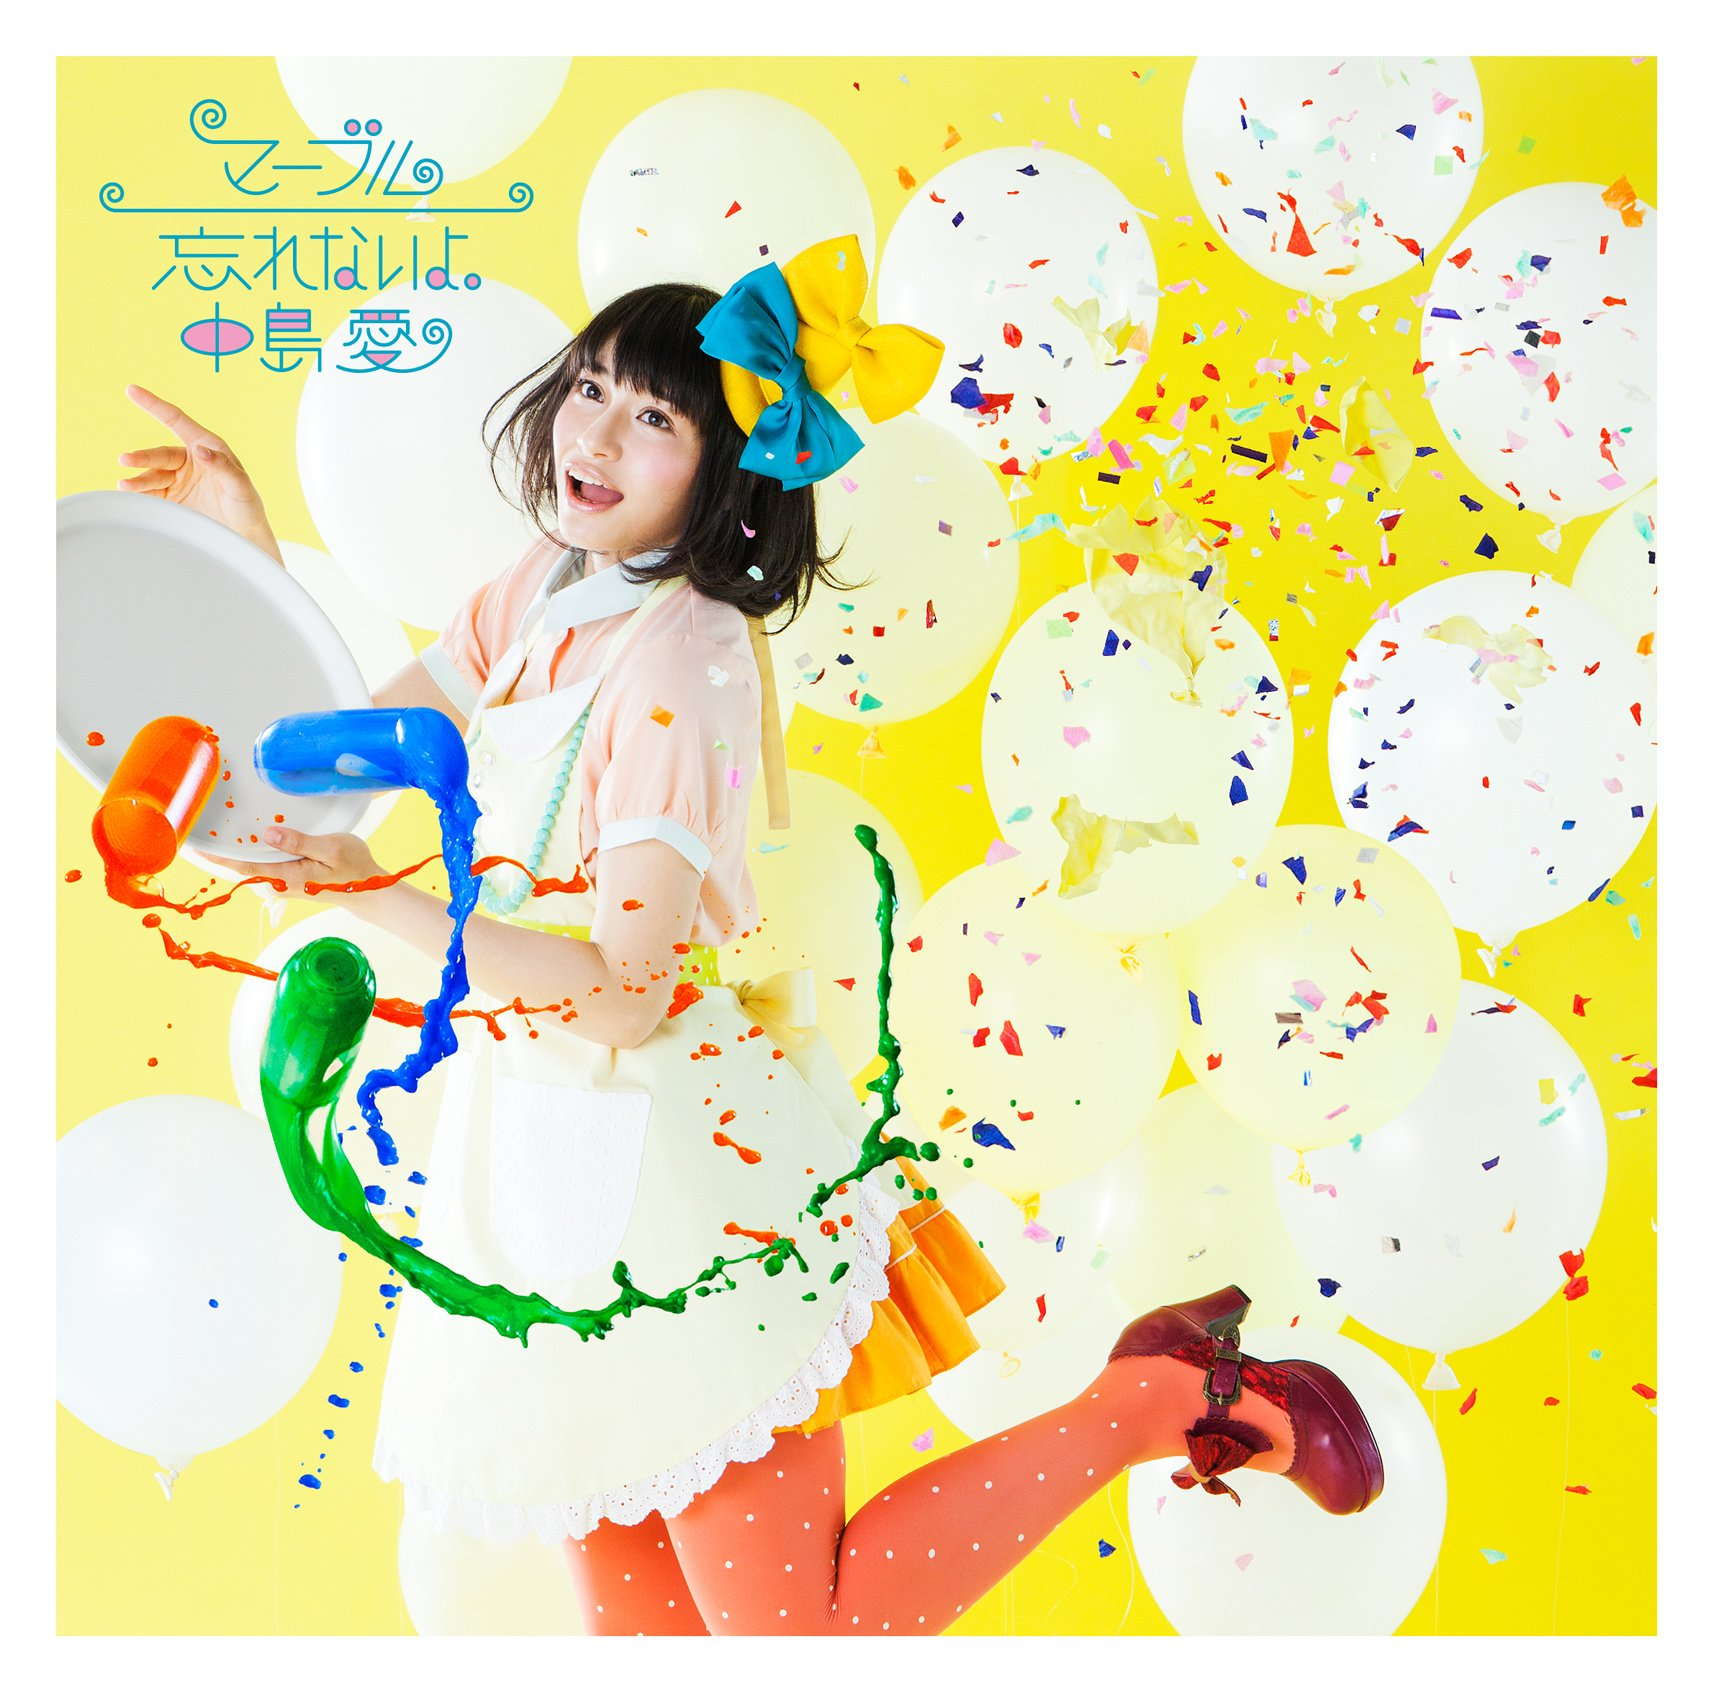 20190110.1240.31 Megumi Nakajima - Marble ~ Wasurenai yo cover 2.jpg